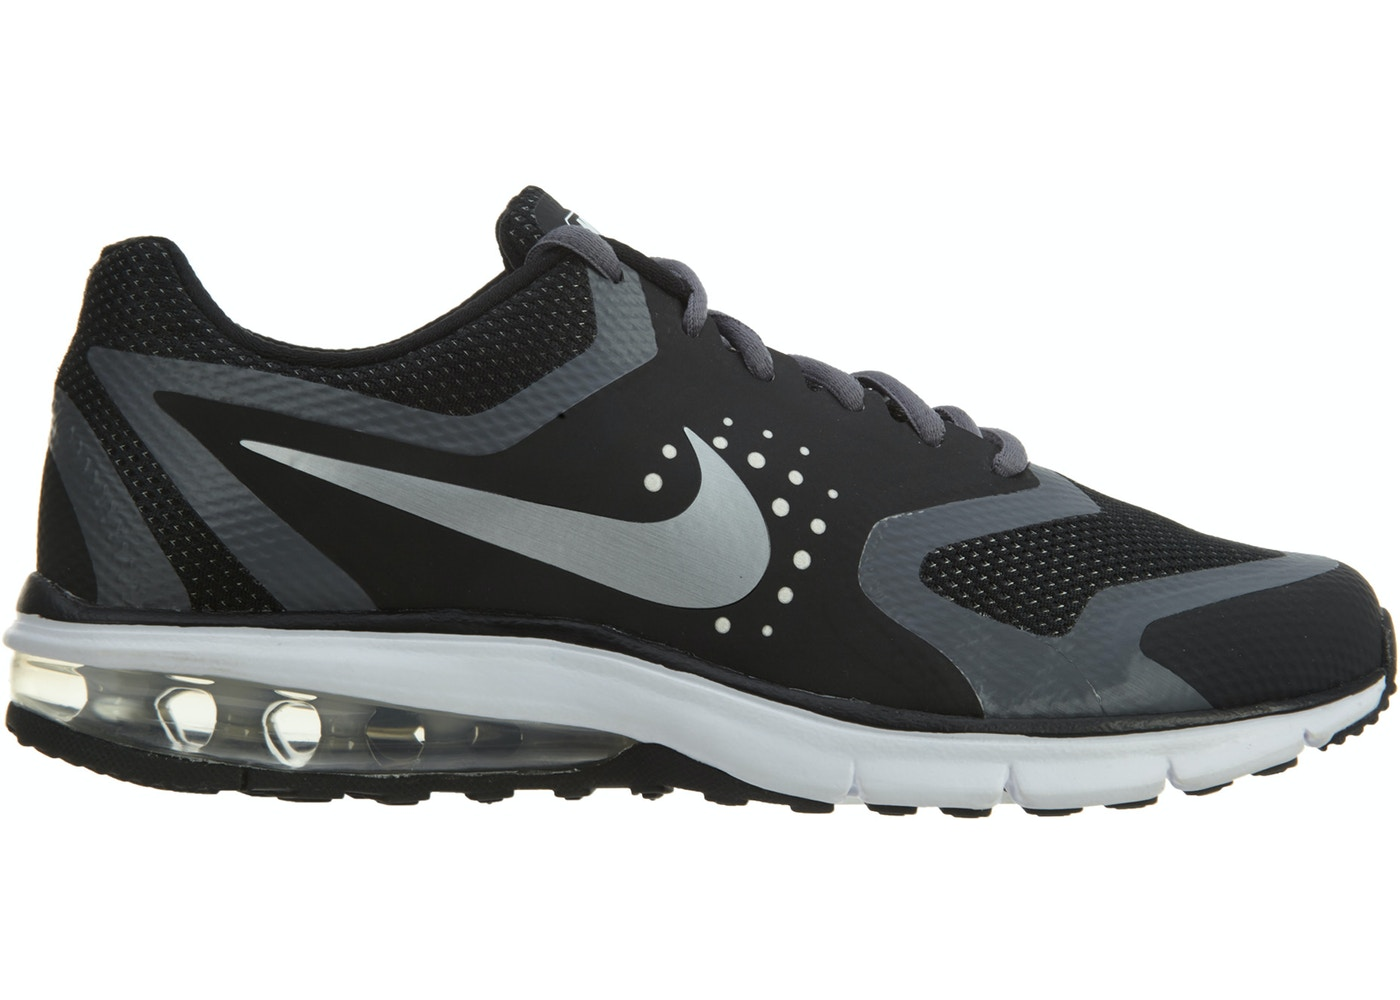 36ddda697e5b4 Nike Air Max Premiere Run Black/Metallic Silver-Dark Grey-White